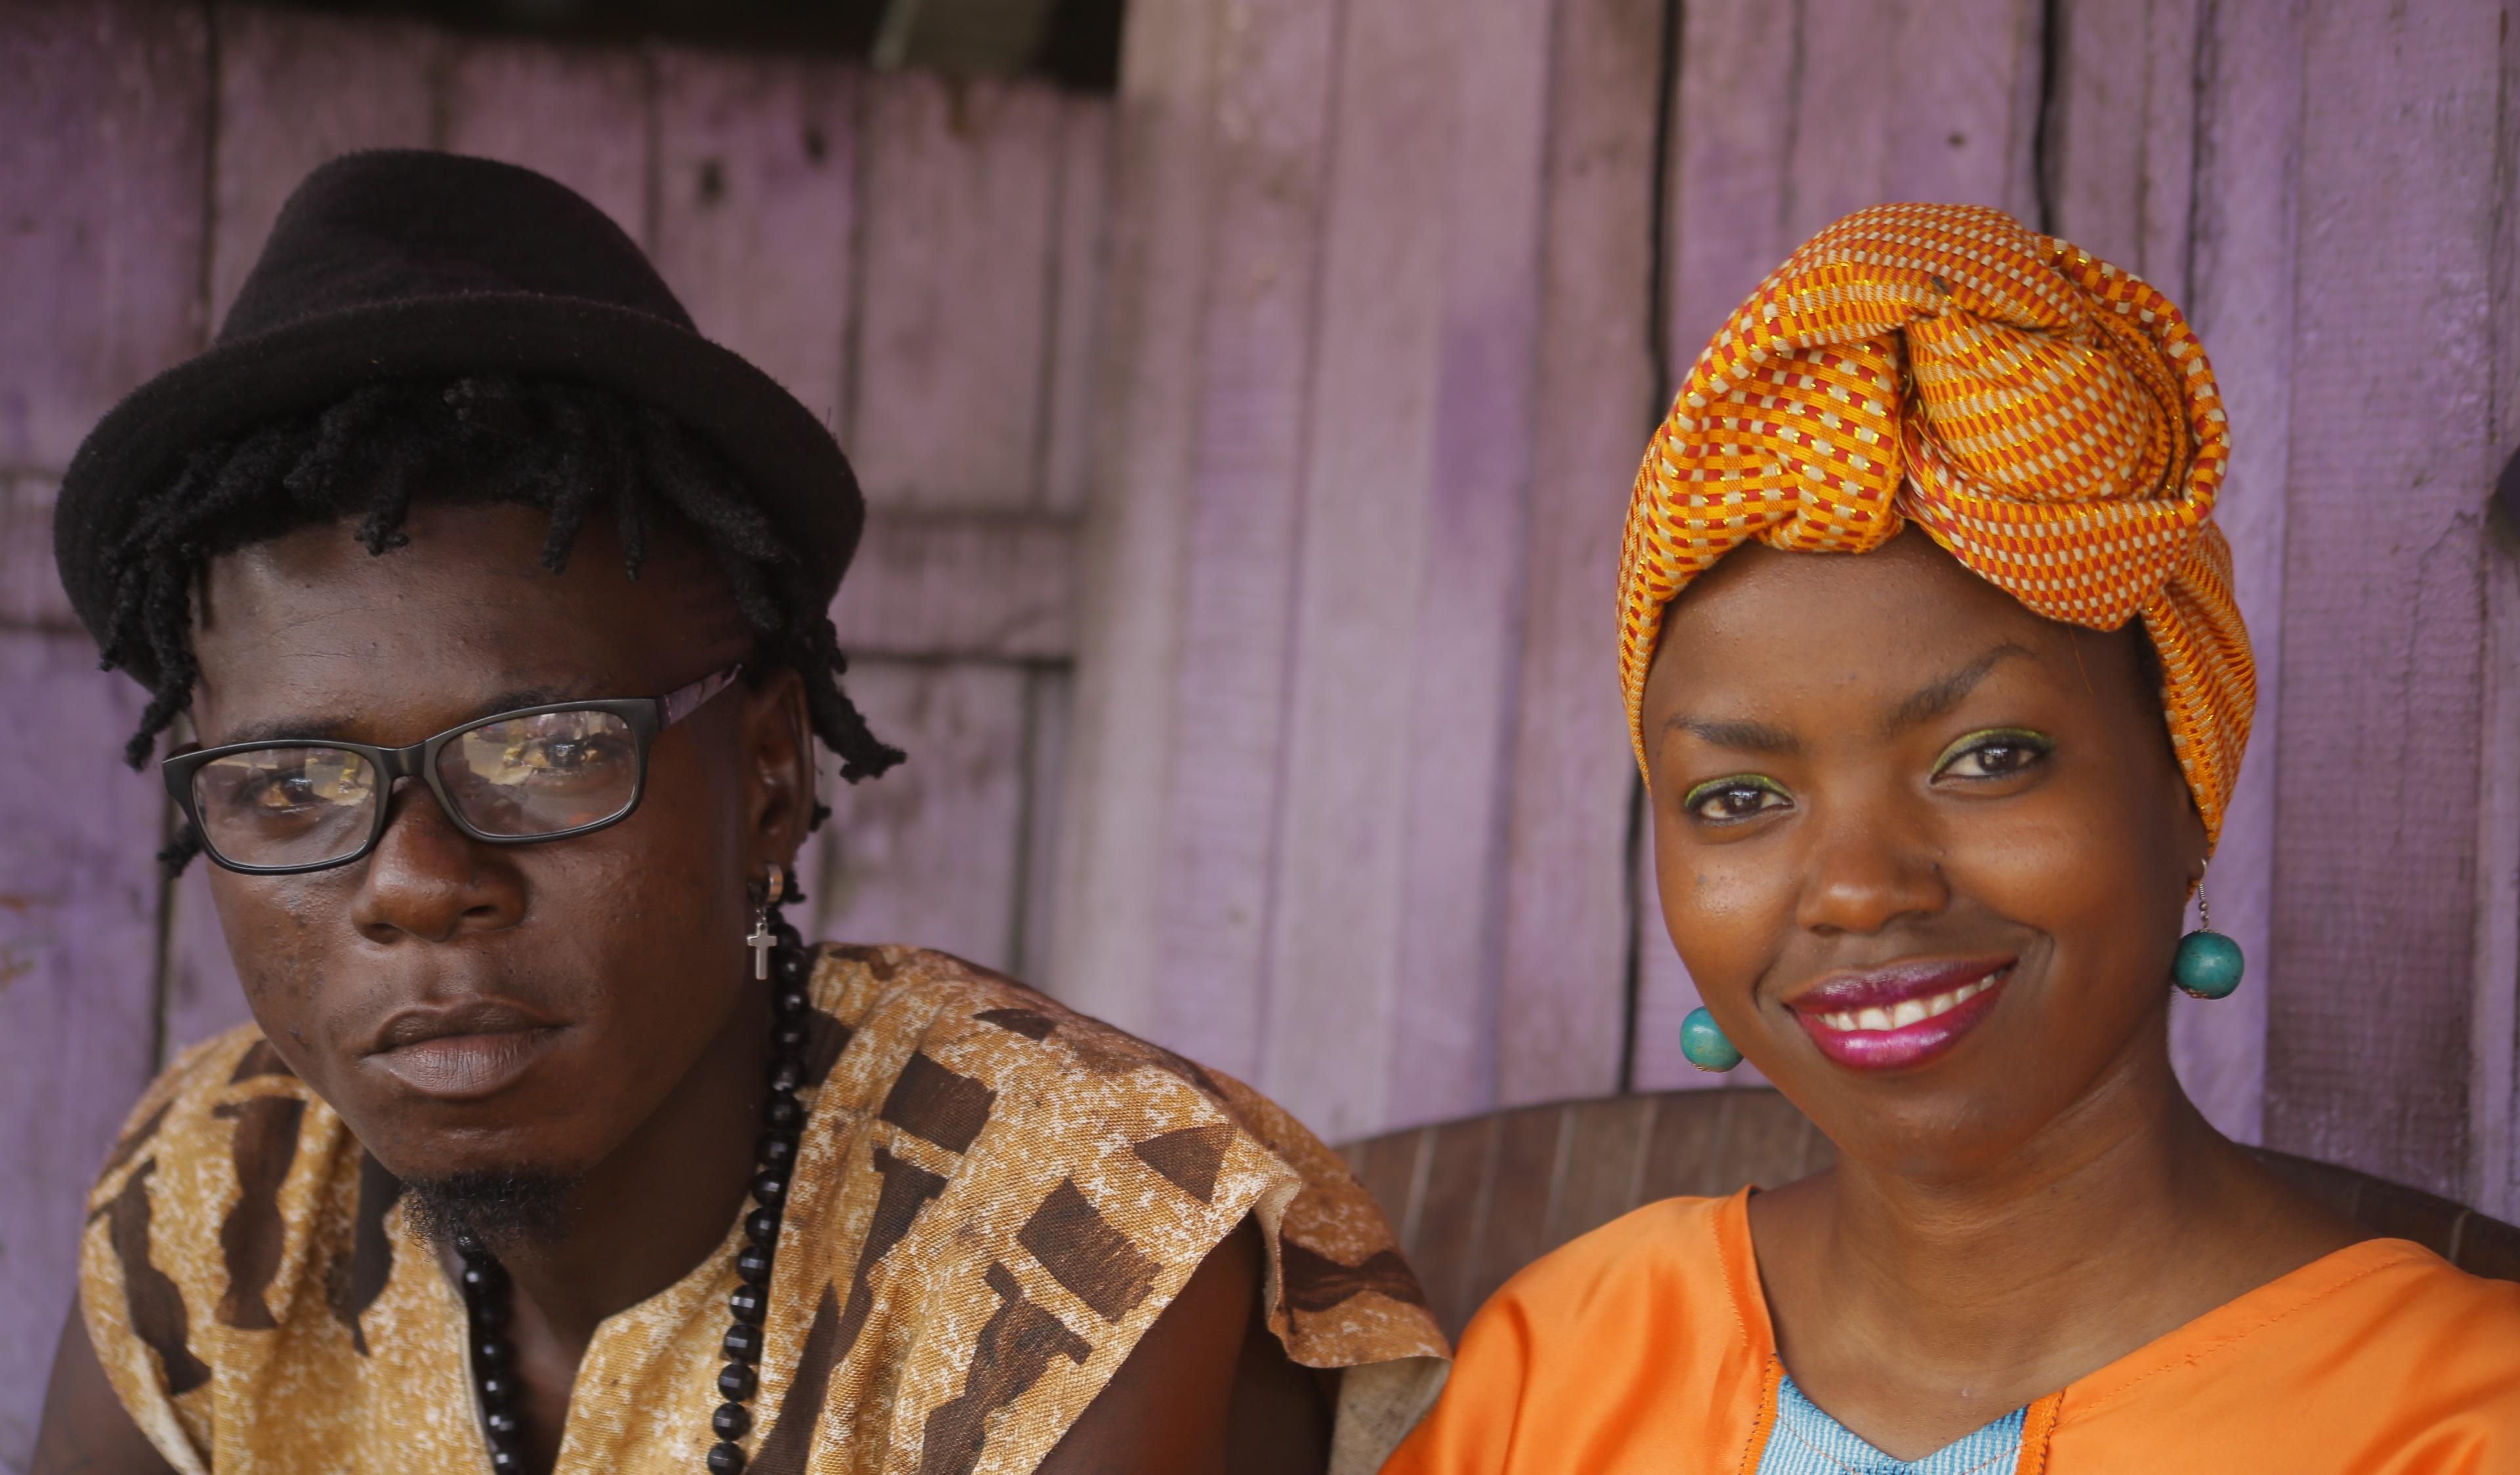 Copik & Tina Mweni